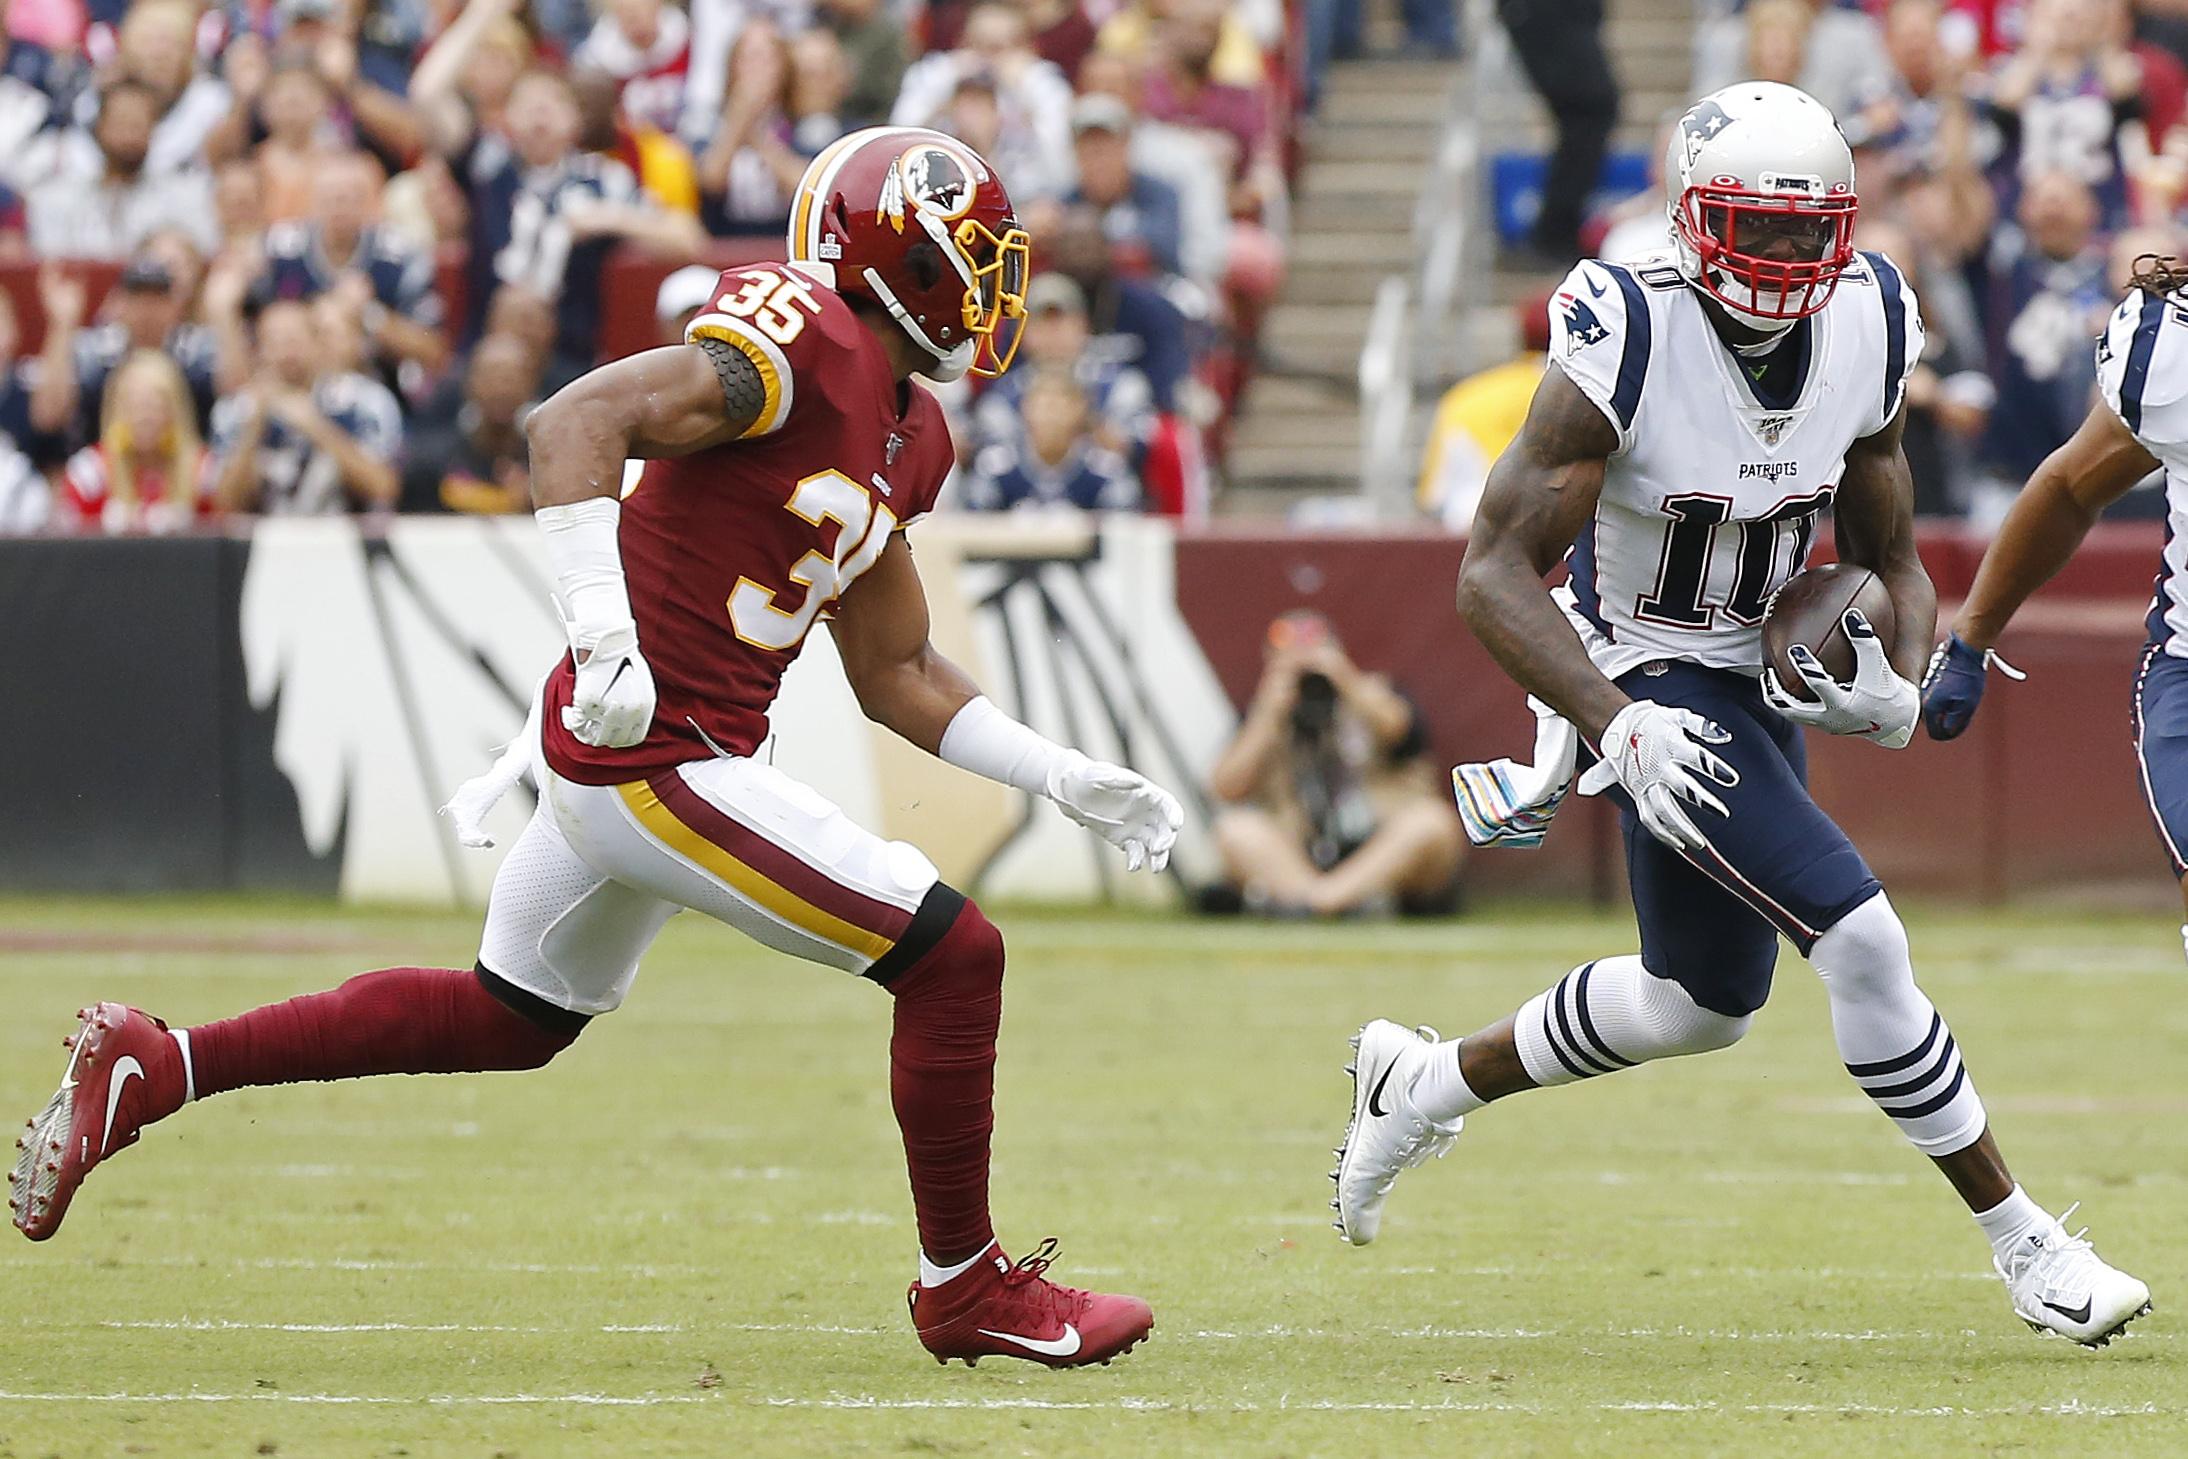 NFL: New England Patriots at Washington Redskins